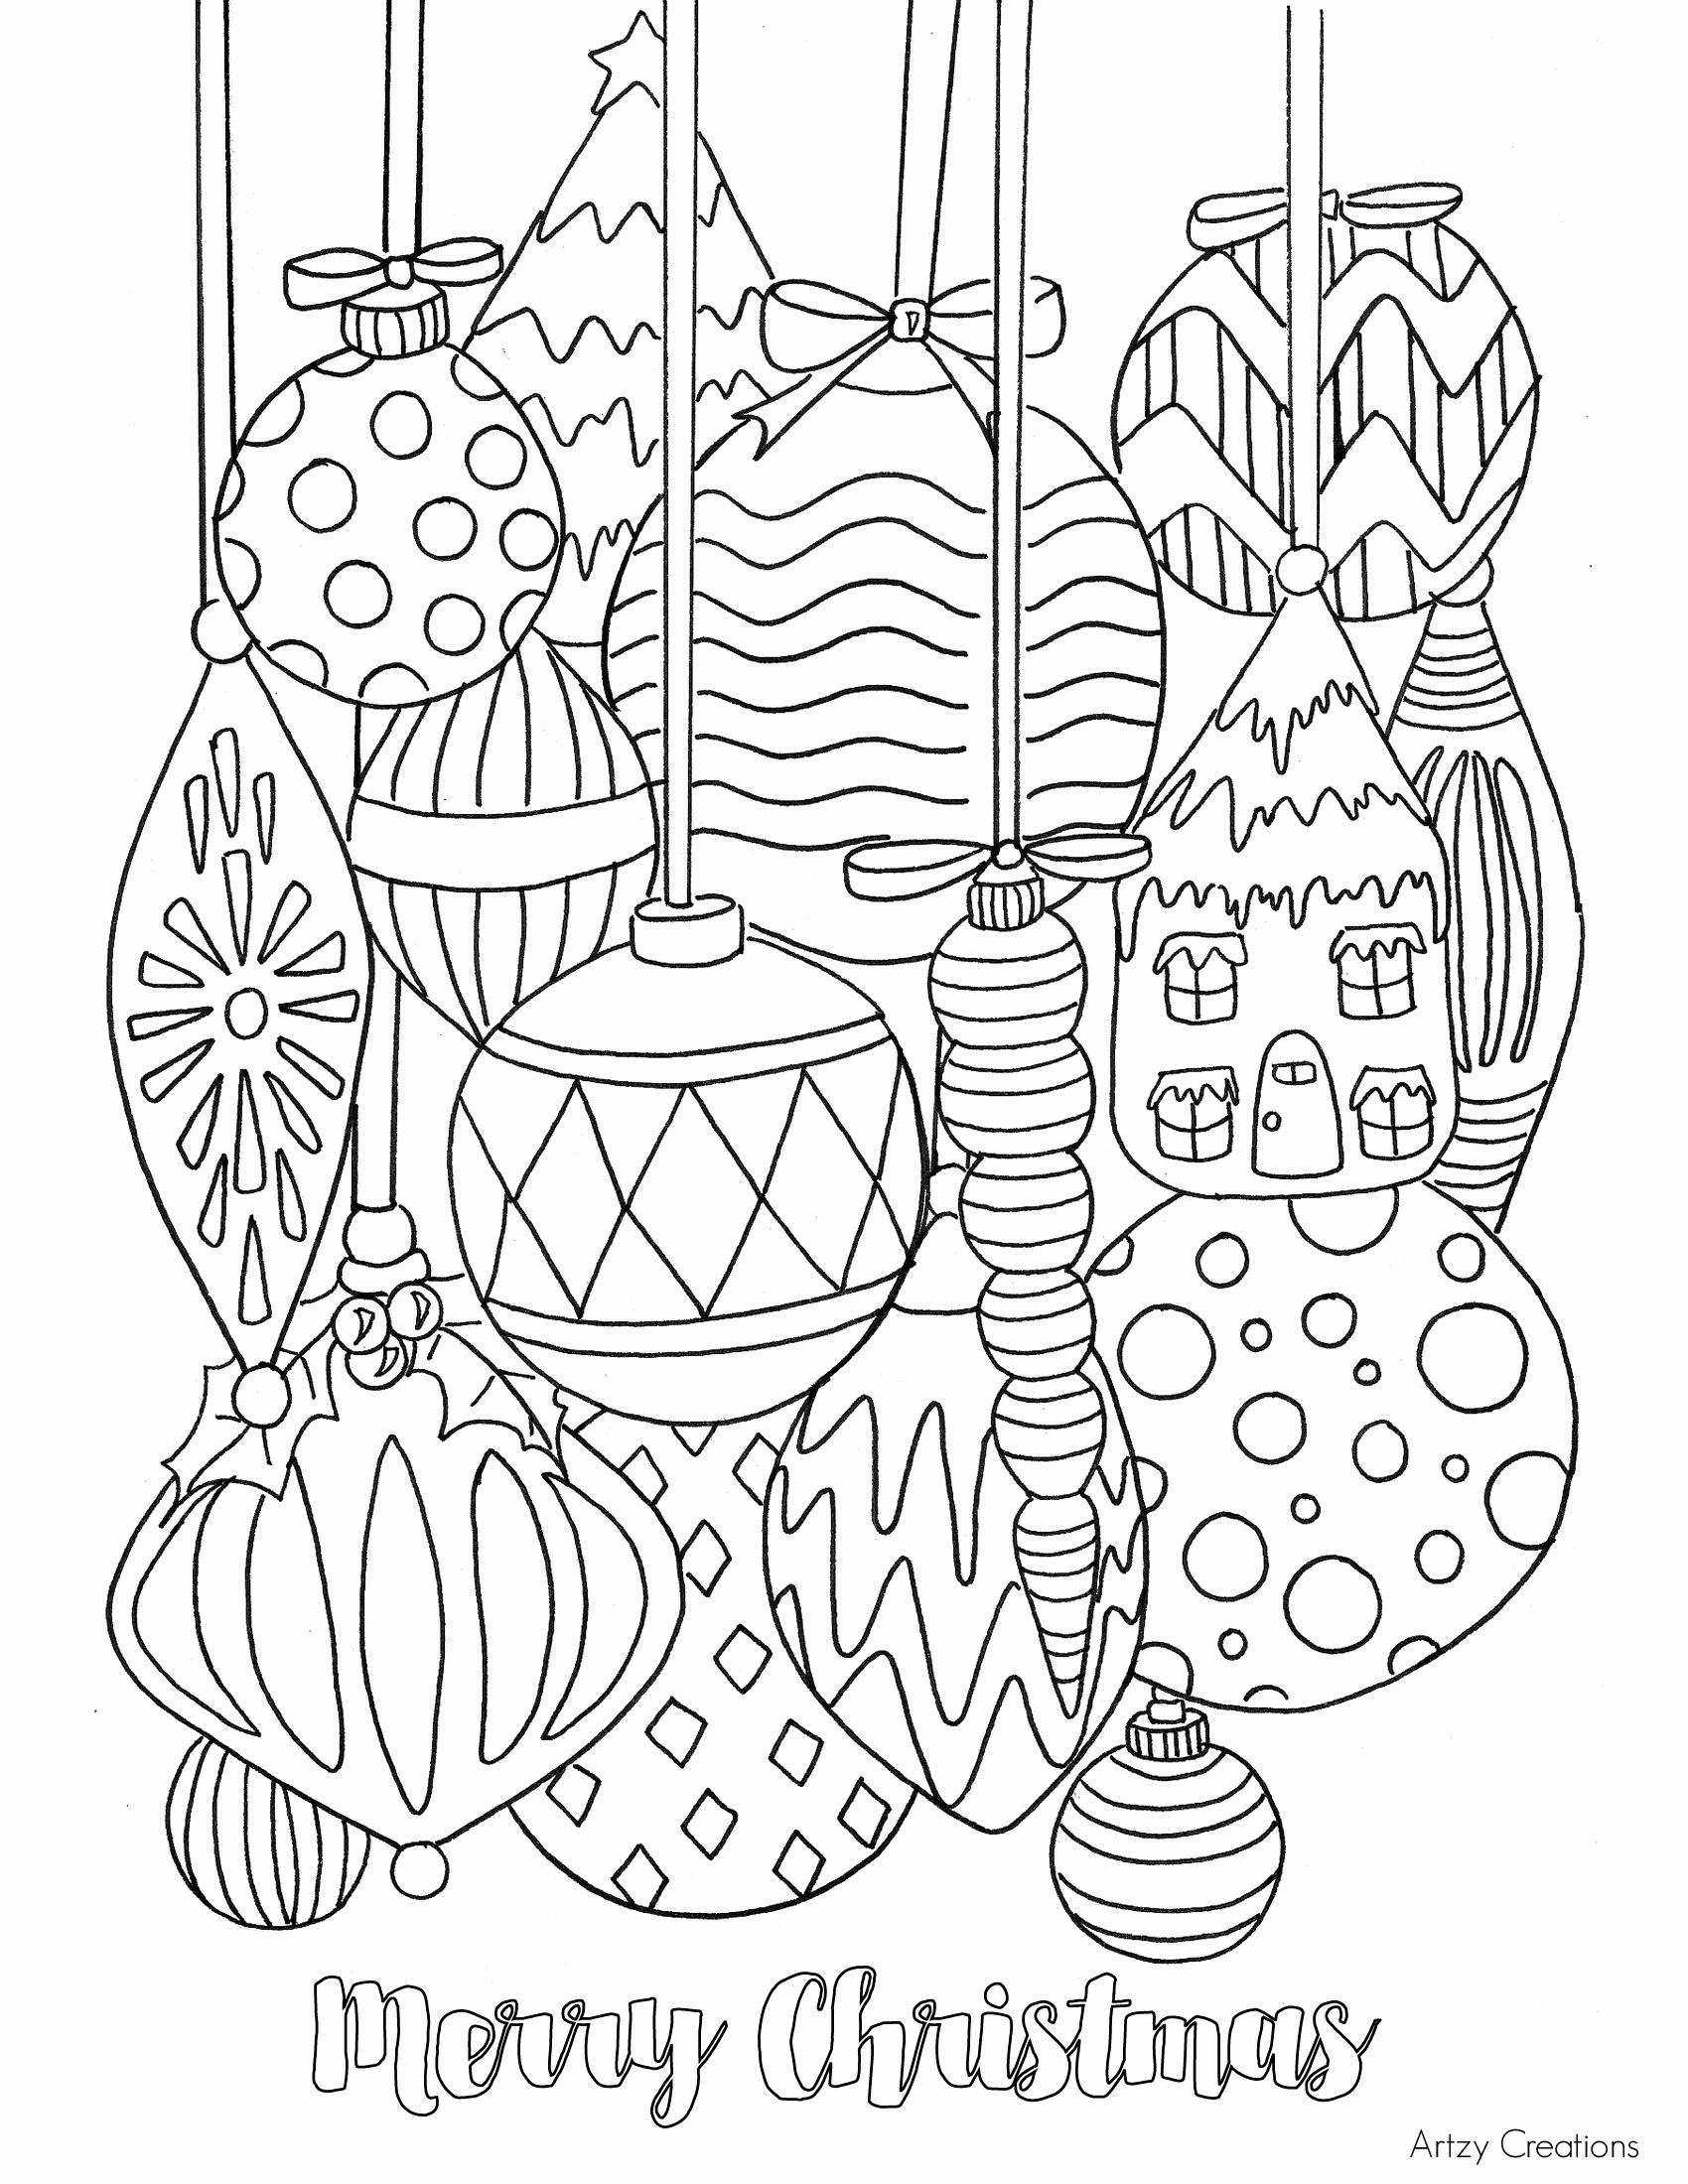 1700x2200 Free Christmas Ornament Coloring Page Tgif This Grandma Is Fun